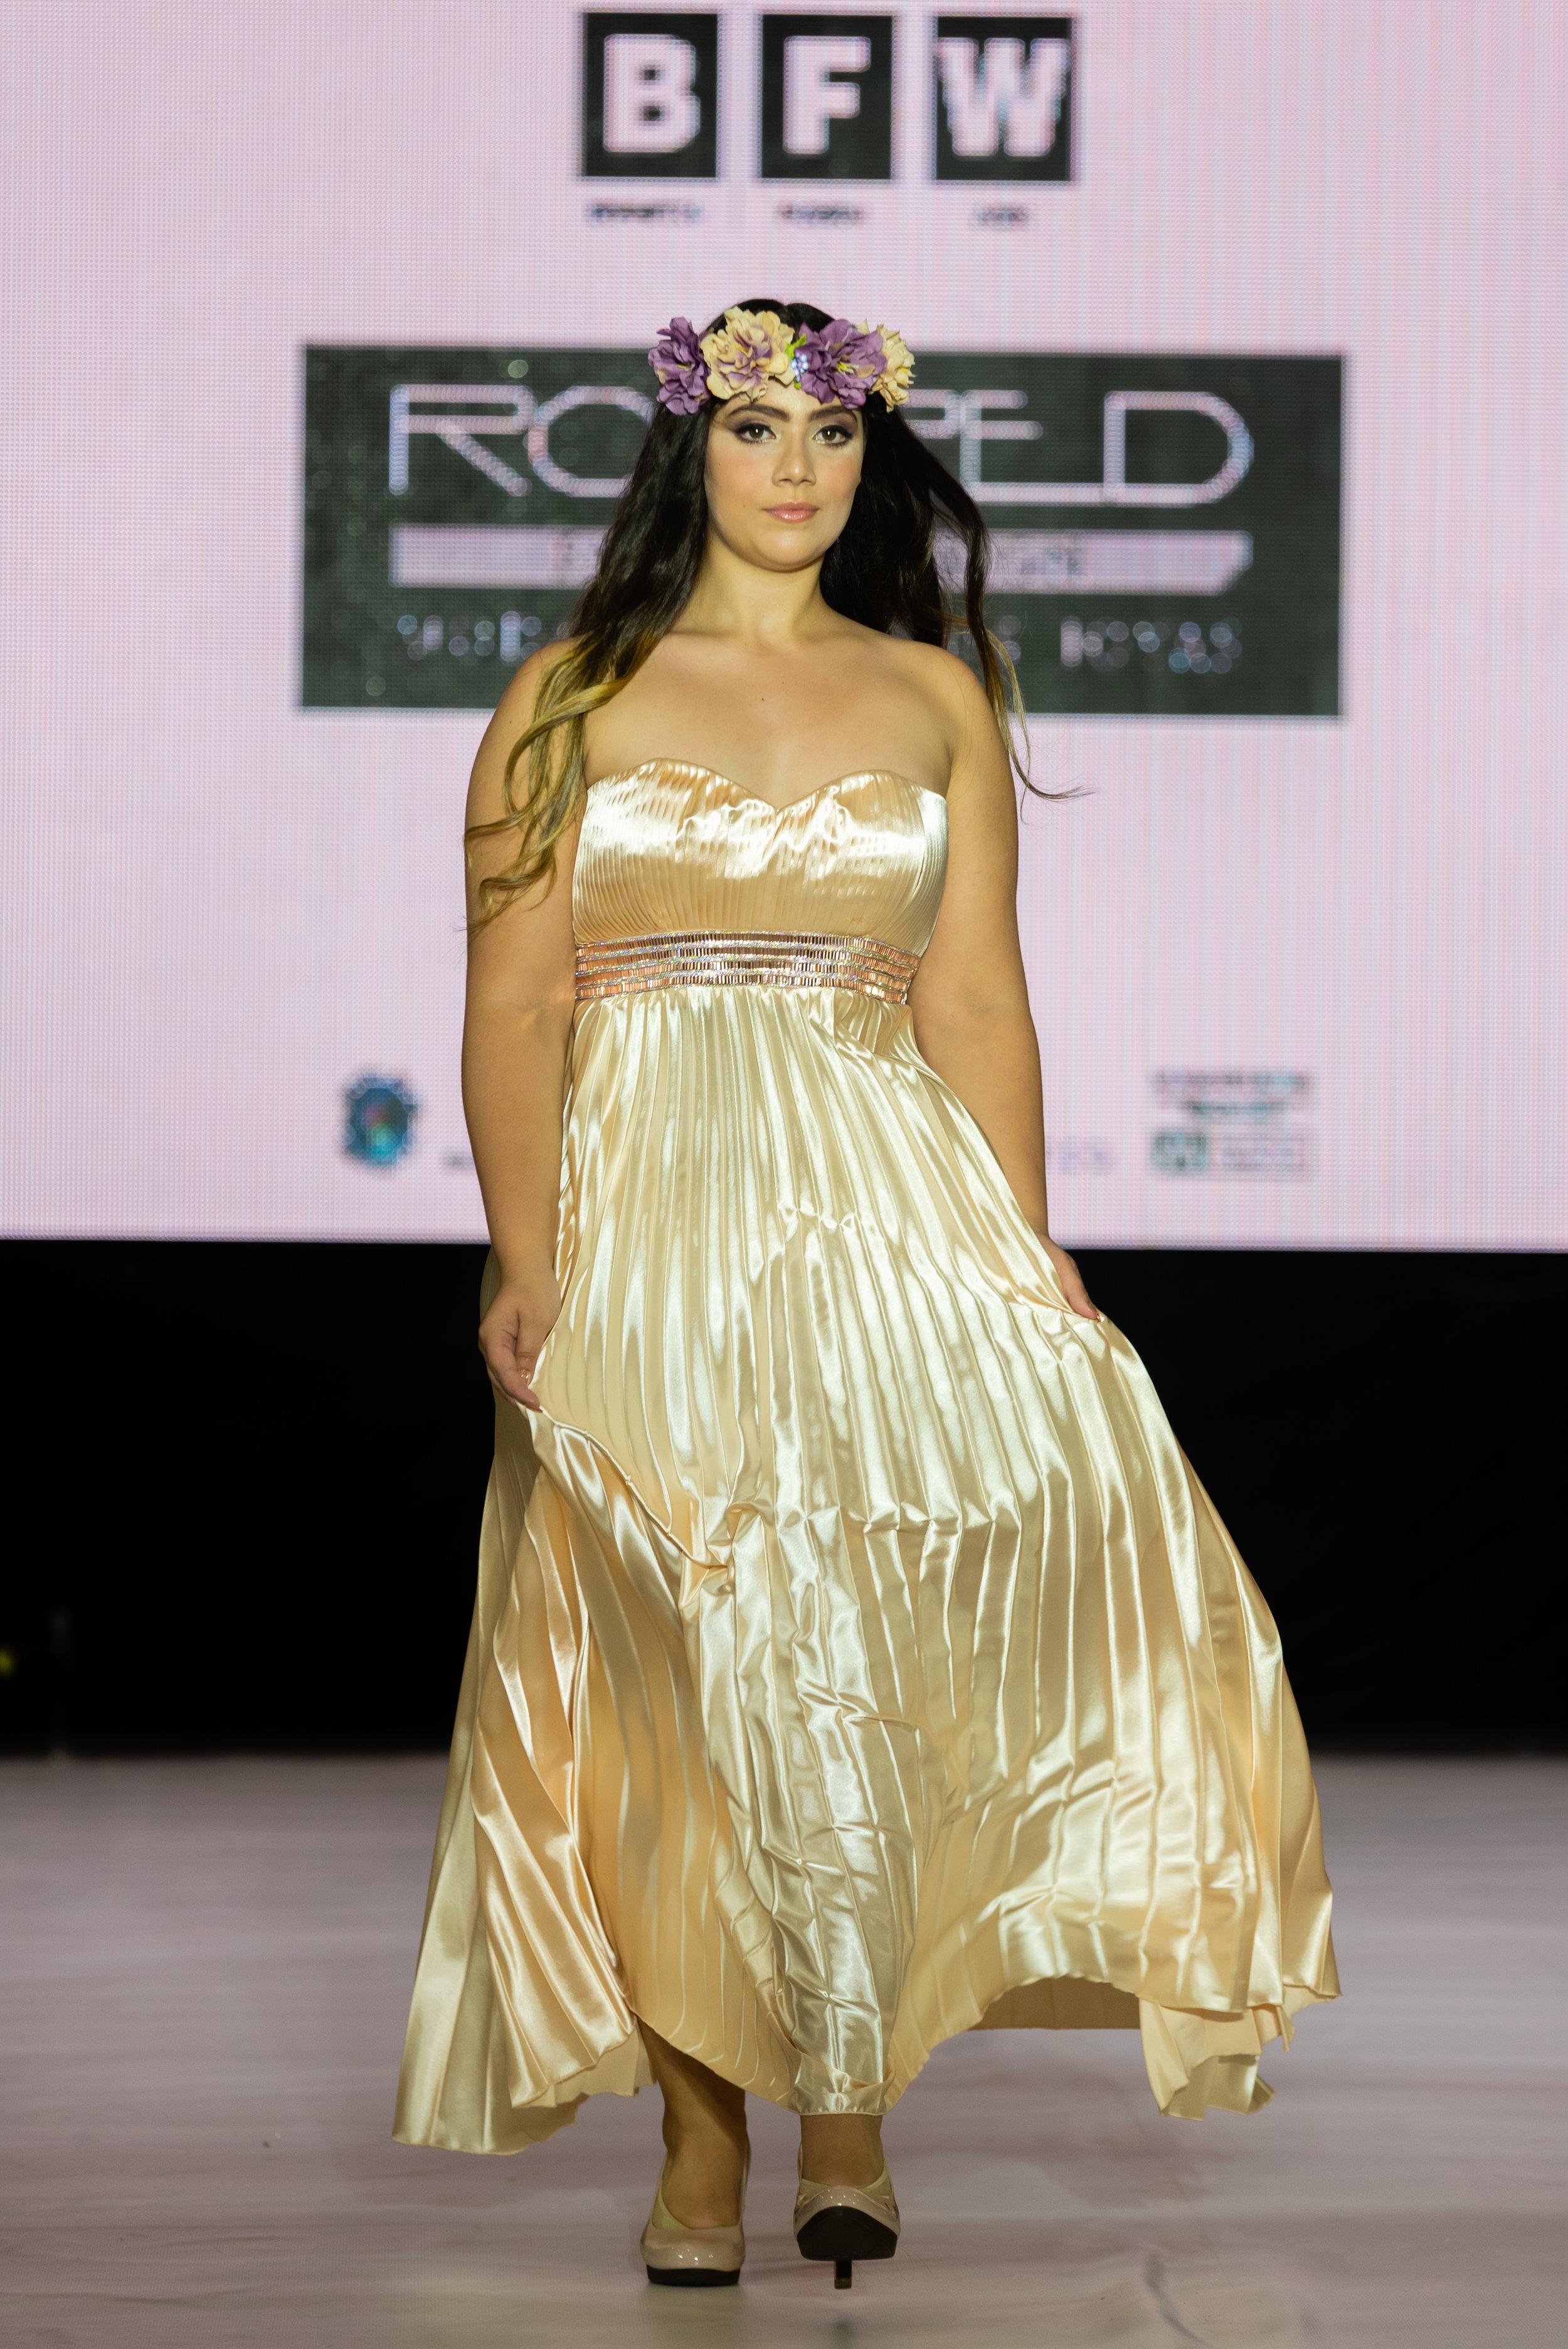 BFW10 - Rosred Fashion Design-SKN_5039.jpg